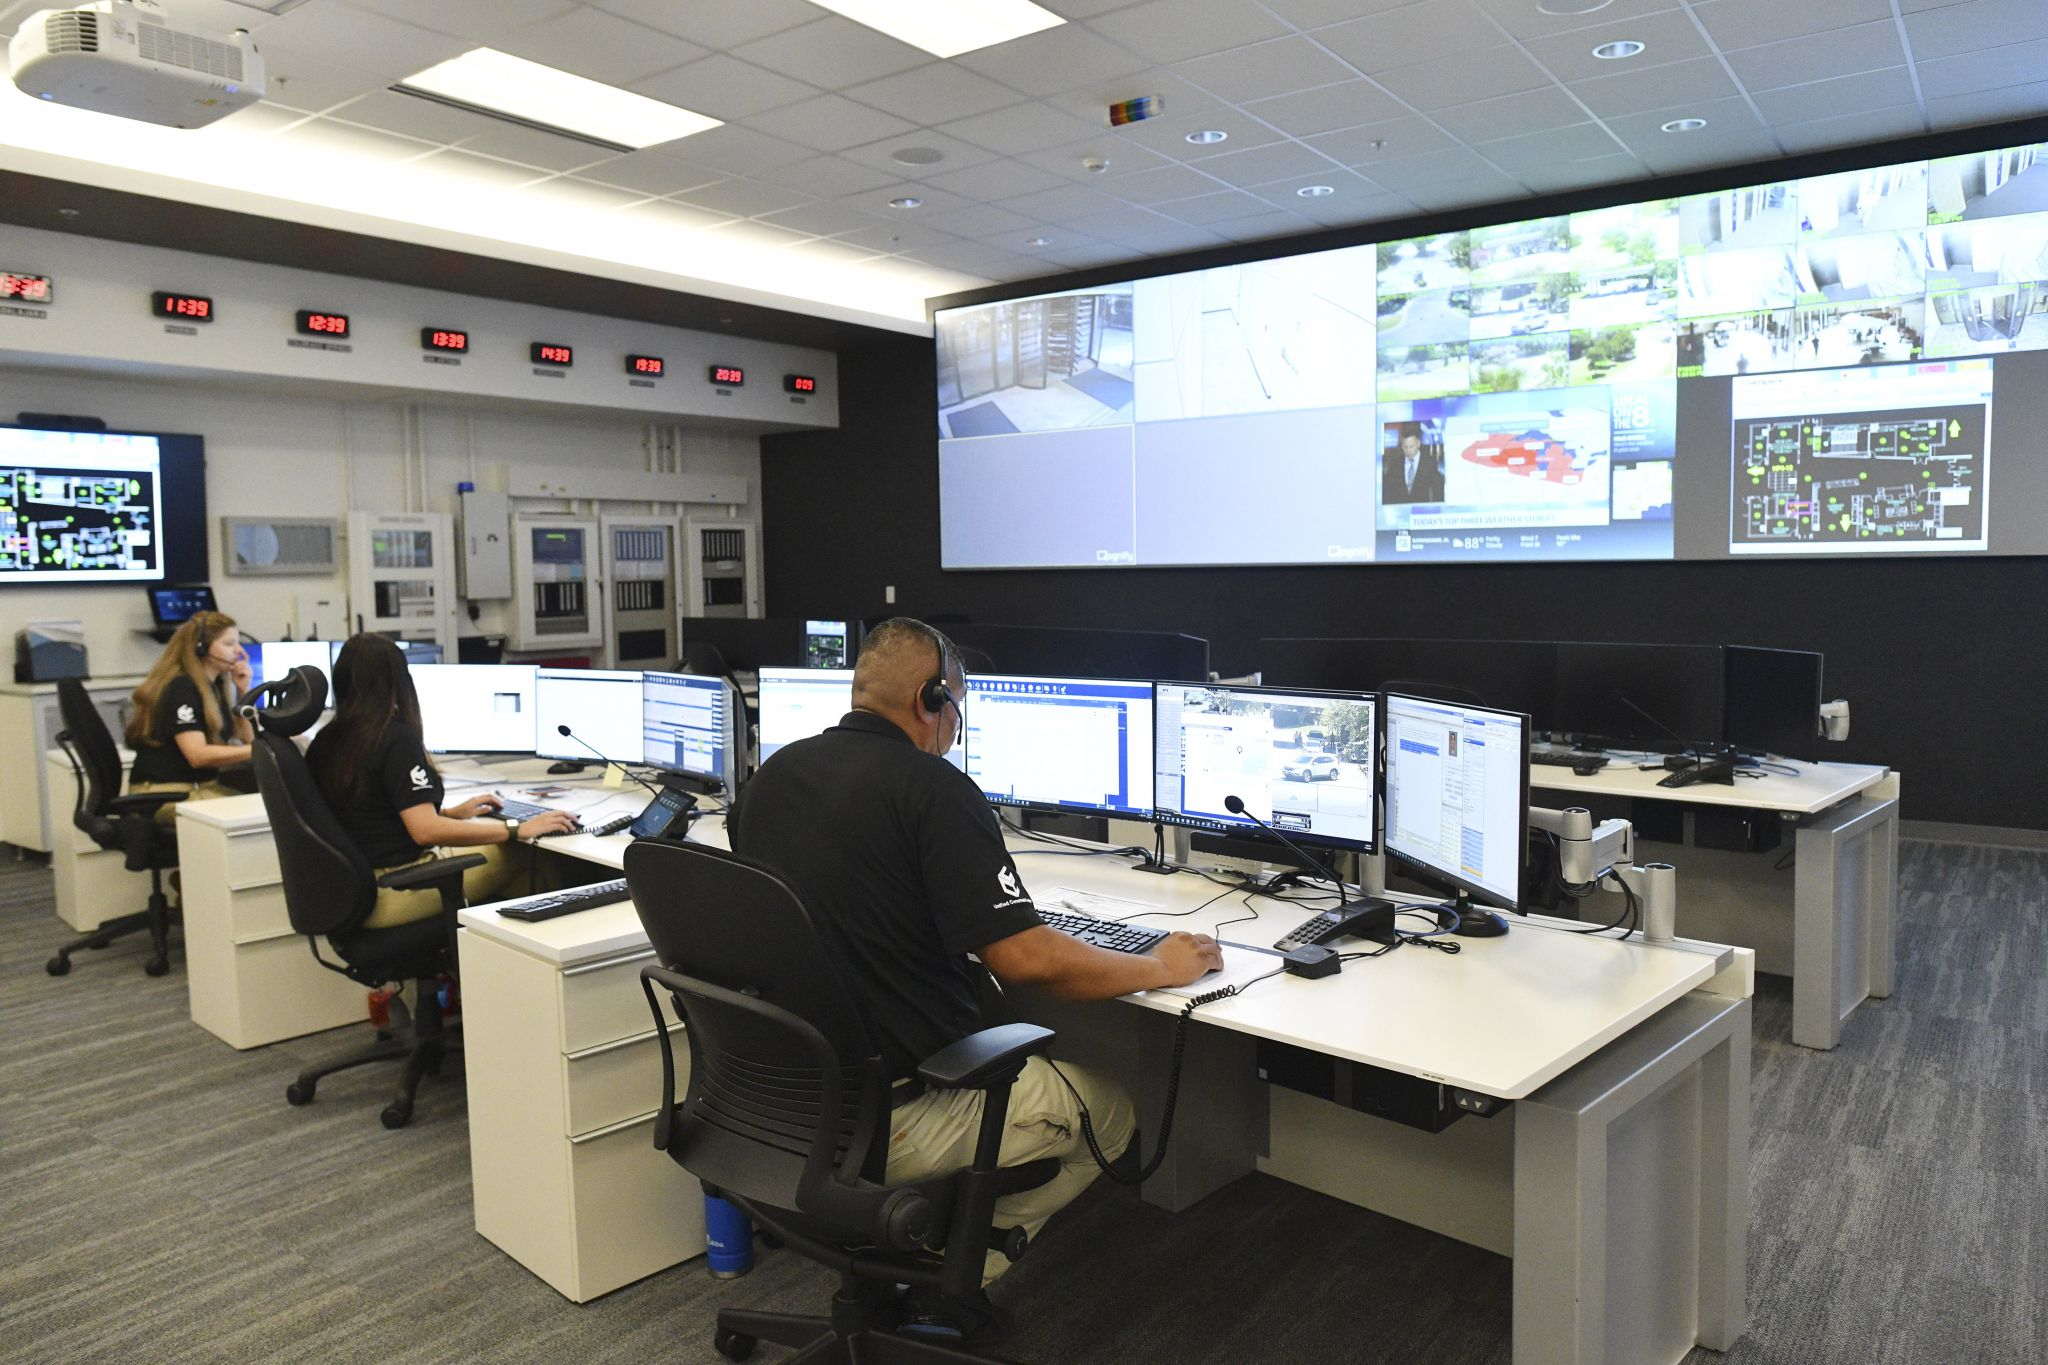 Usaa Renovates 24 7 Hub For Monitoring Emergencies Expressnews Com